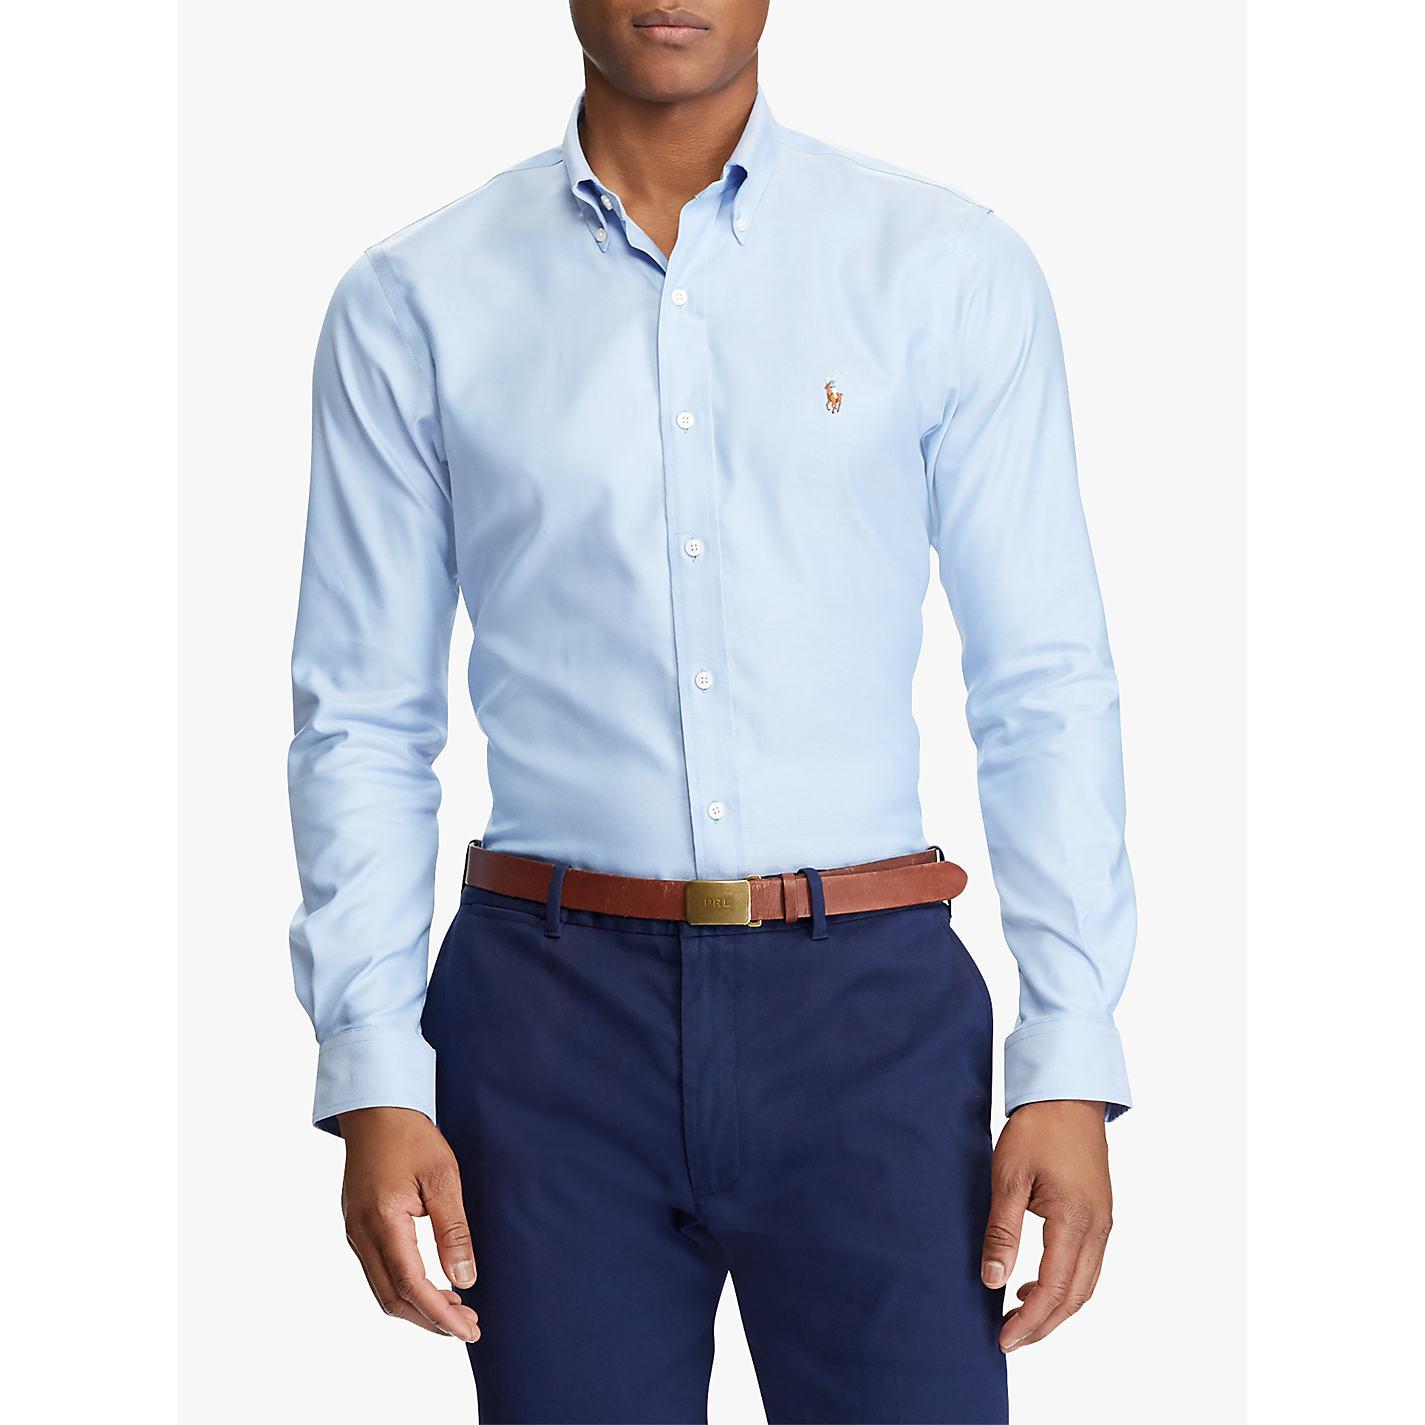 Buy Polo Golf By Ralph Lauren Non Iron Oxford Shirt John Lewis # Muebles Ralph Lauren Espana